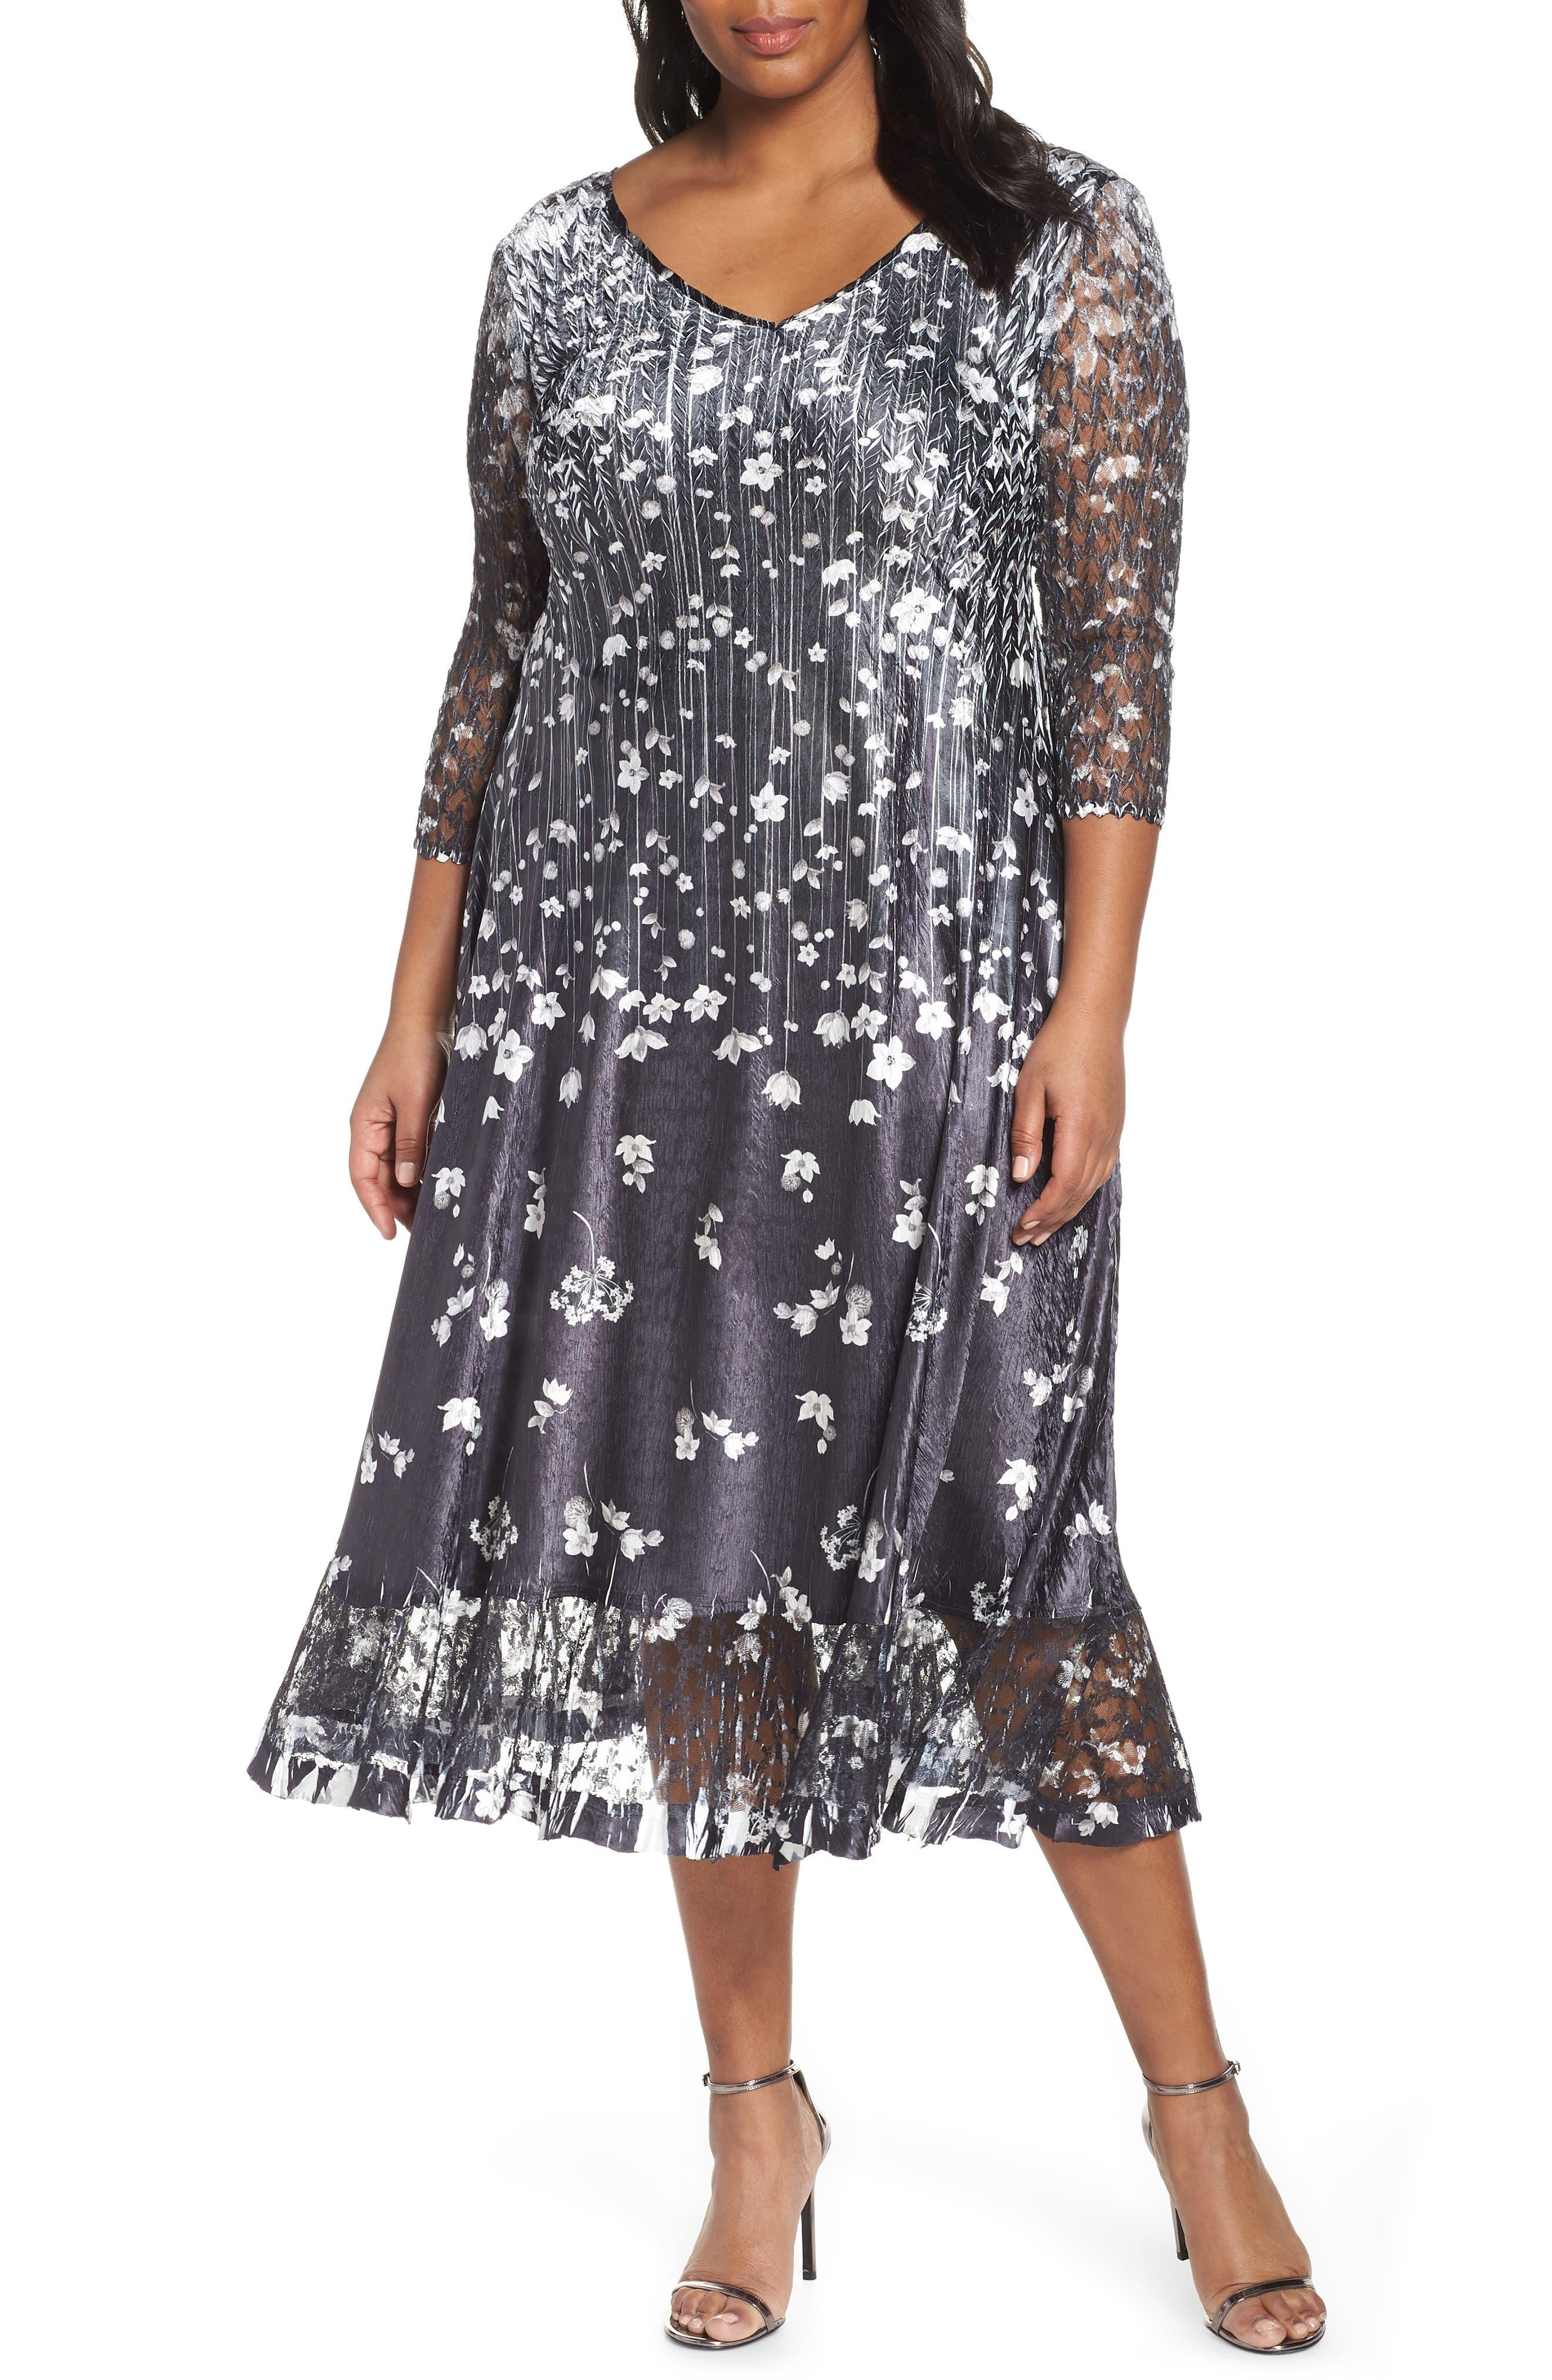 KOMAROV, Floral Print A-Line Dress, Main thumbnail 1, color, BLACK MEADOW